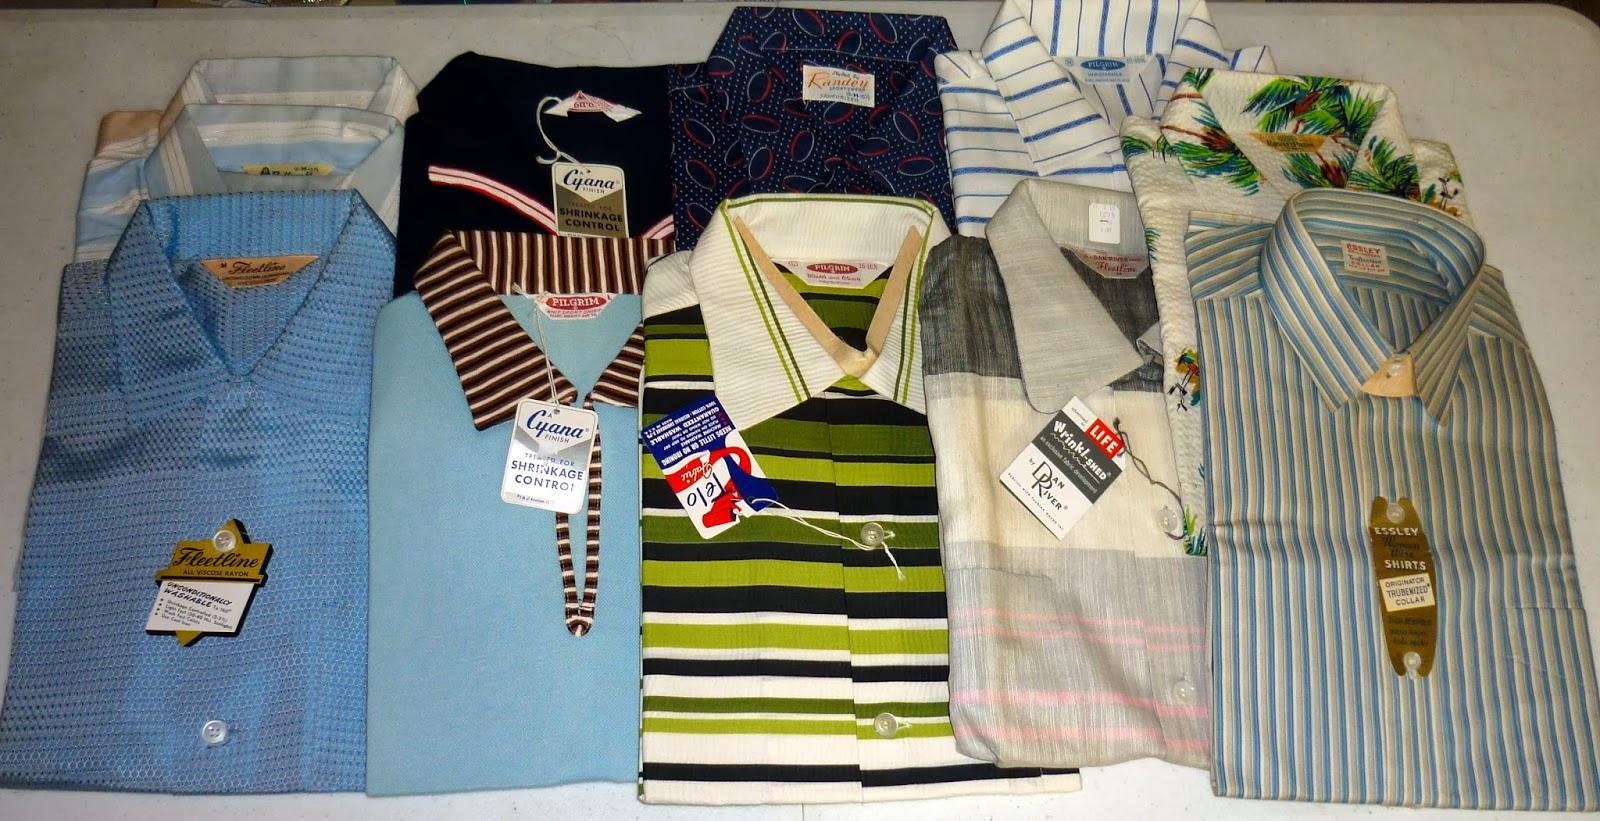 Real Vintage Clothing: Men's Vintage Clothing